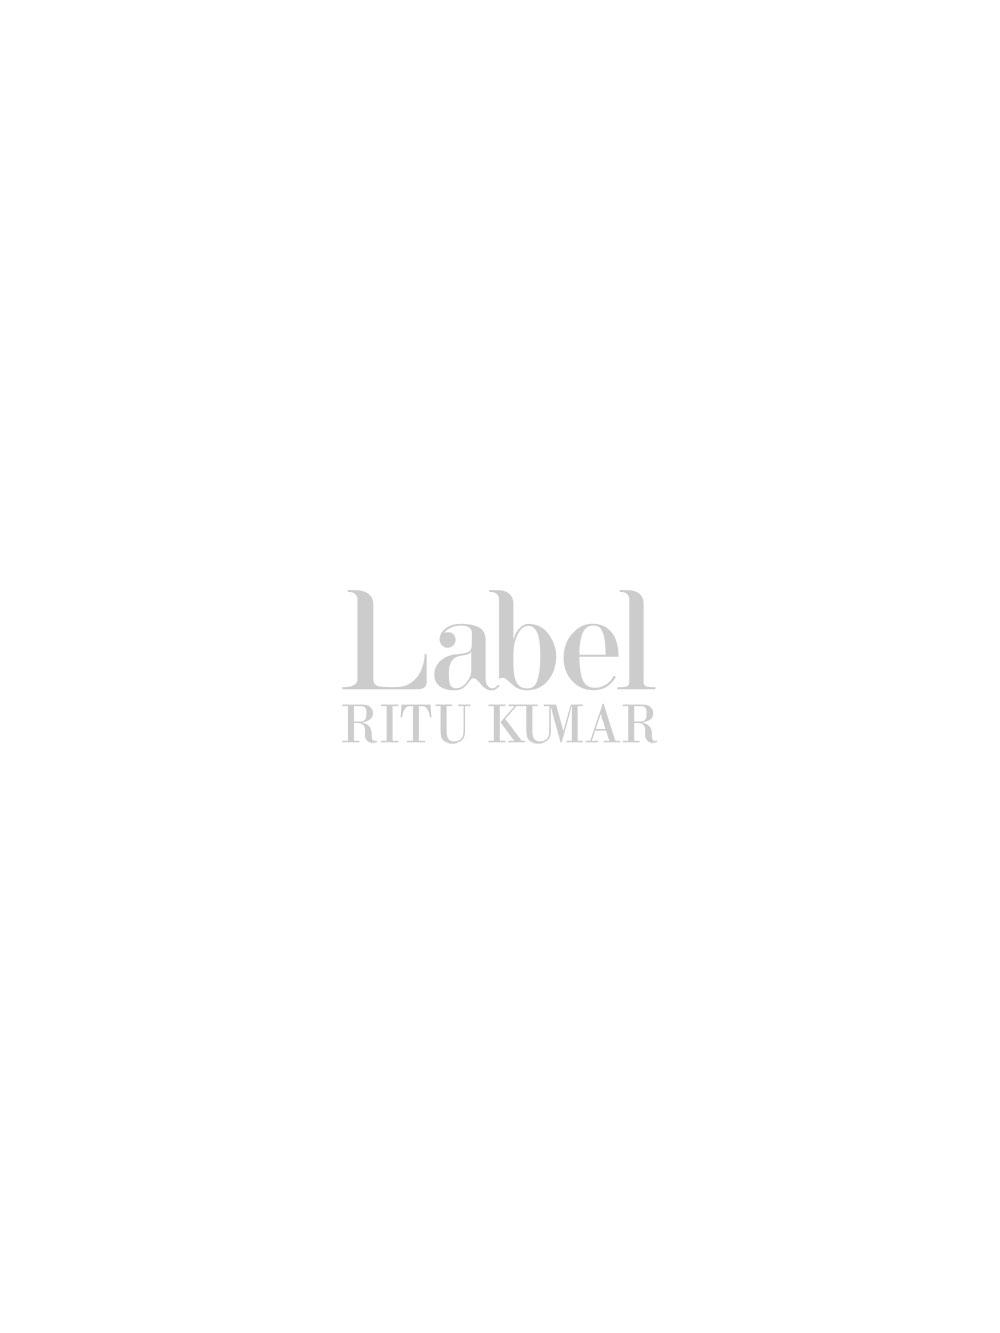 Designer Off White Short Dress in Gold Embroidered